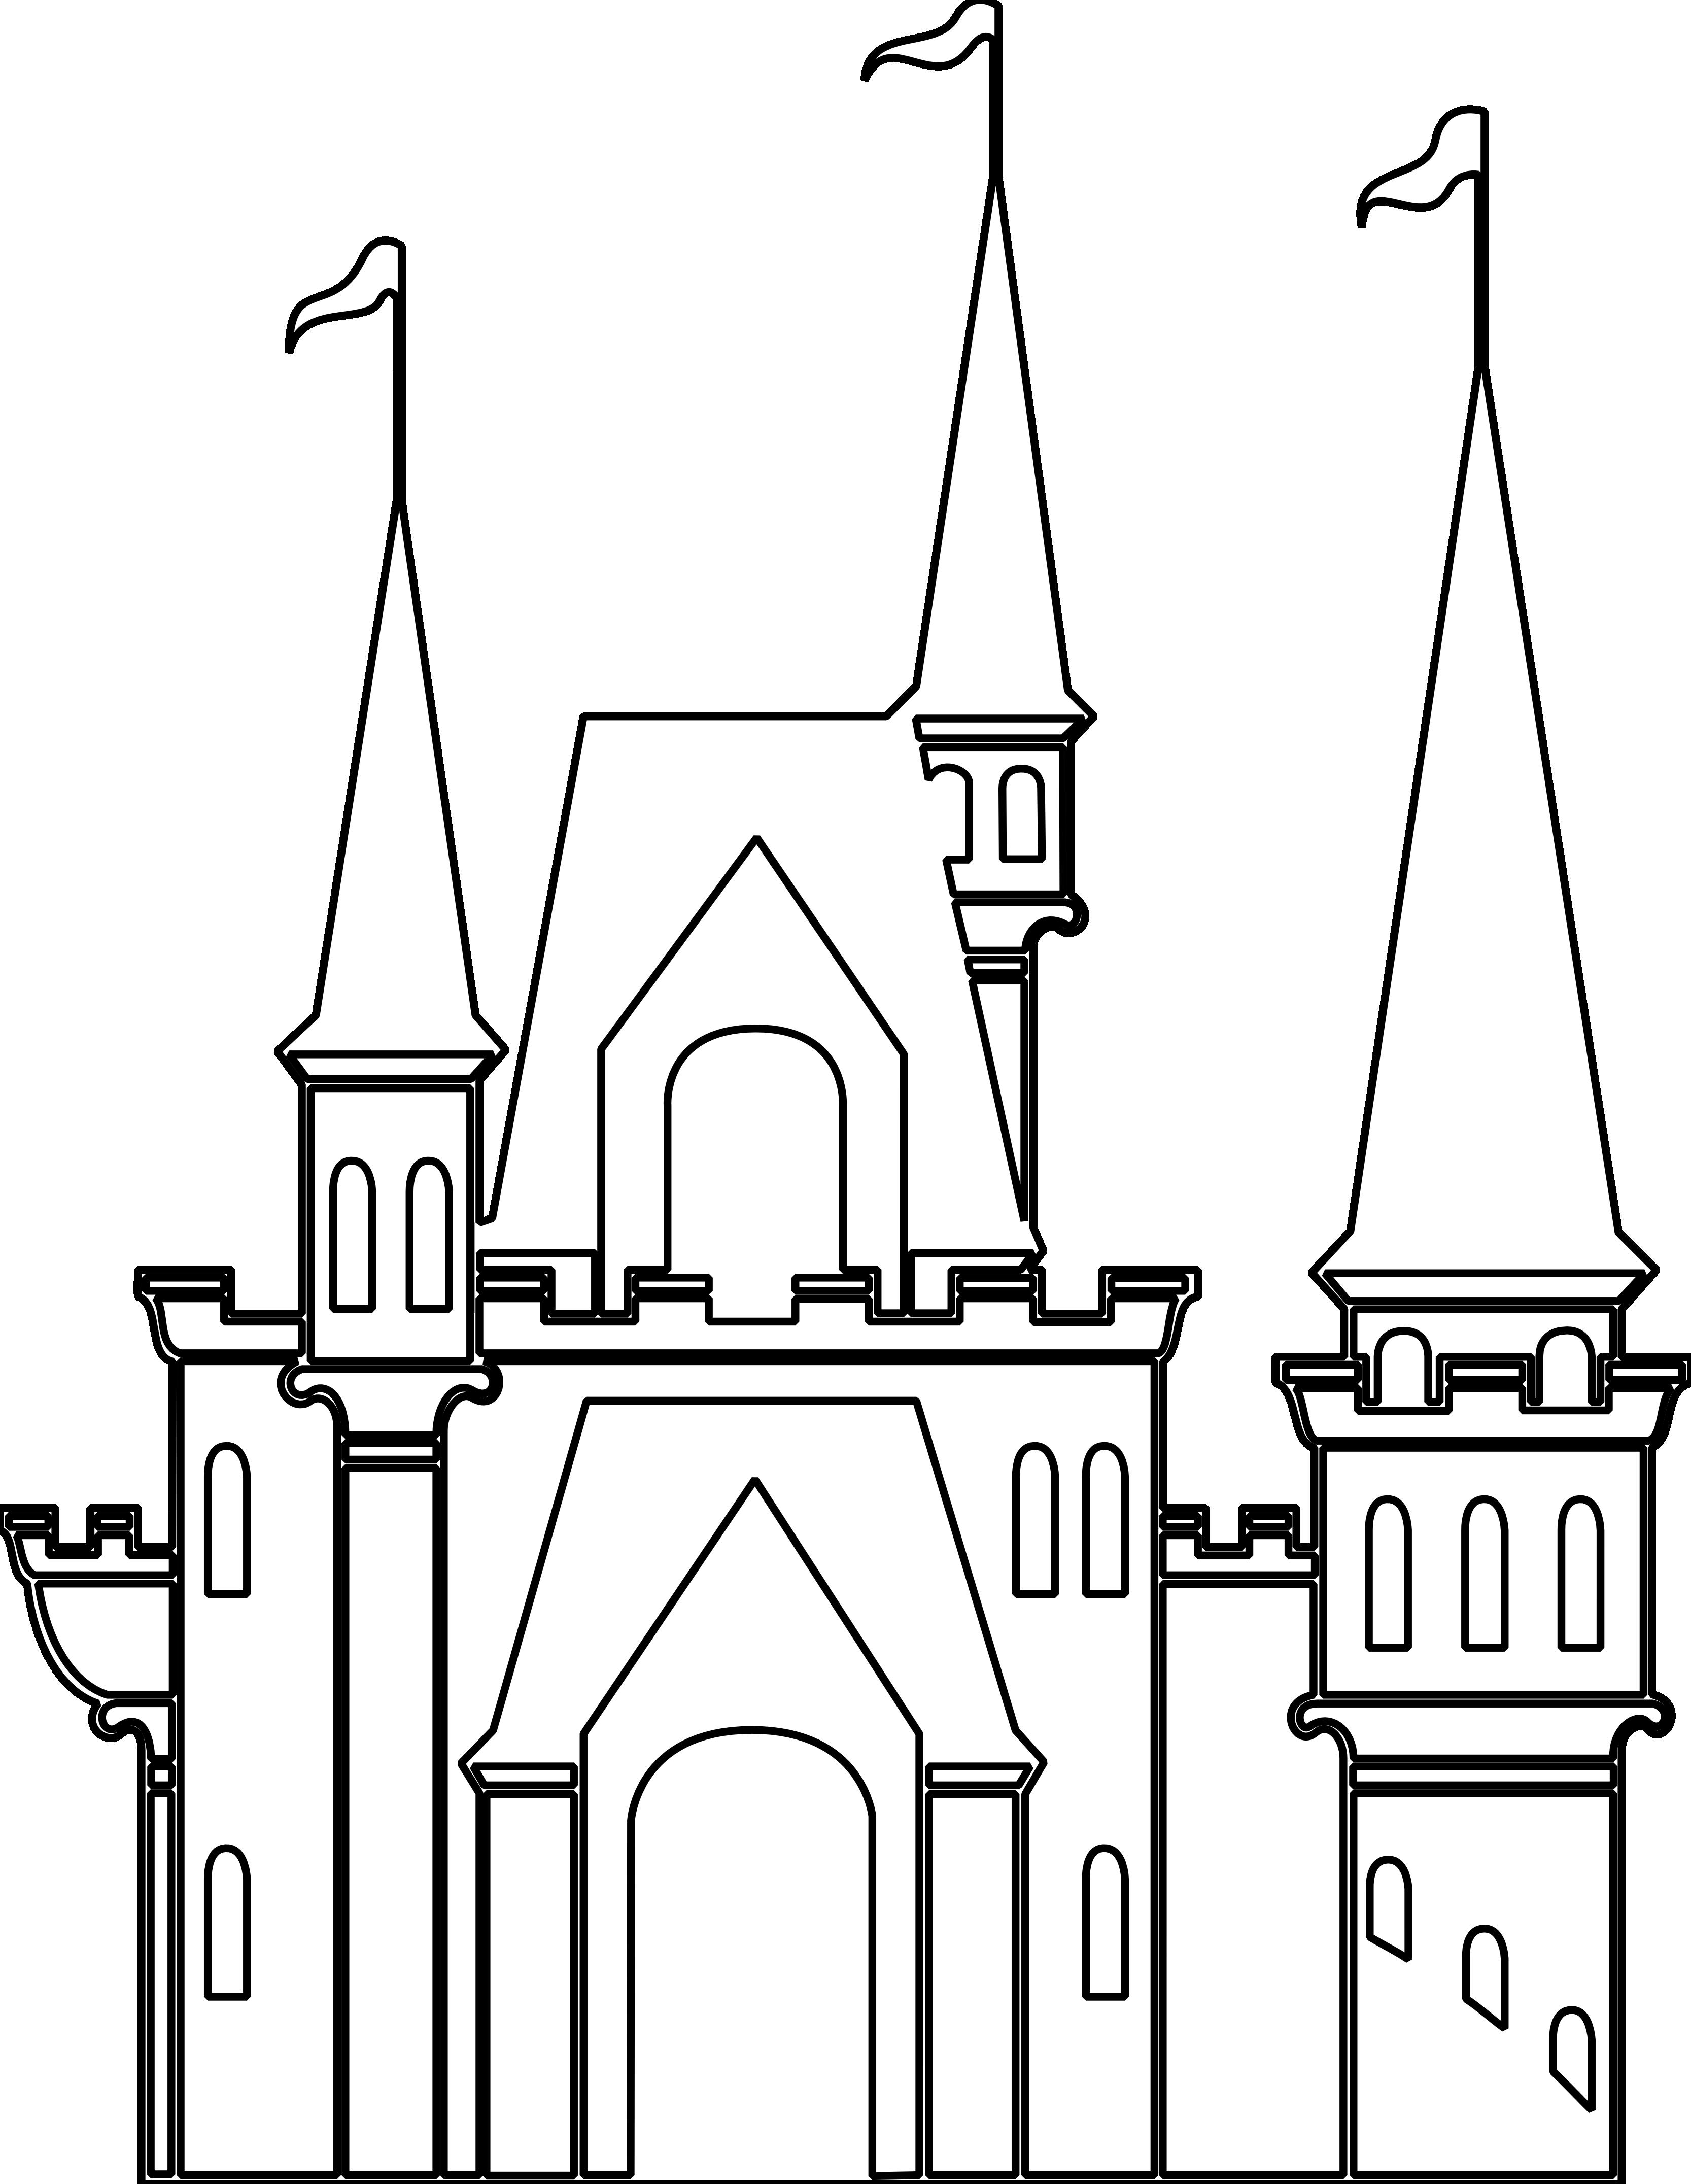 Disney kingdom clipart simple clip art freeuse download Disney castle clipart simple - ClipartFest clip art freeuse download